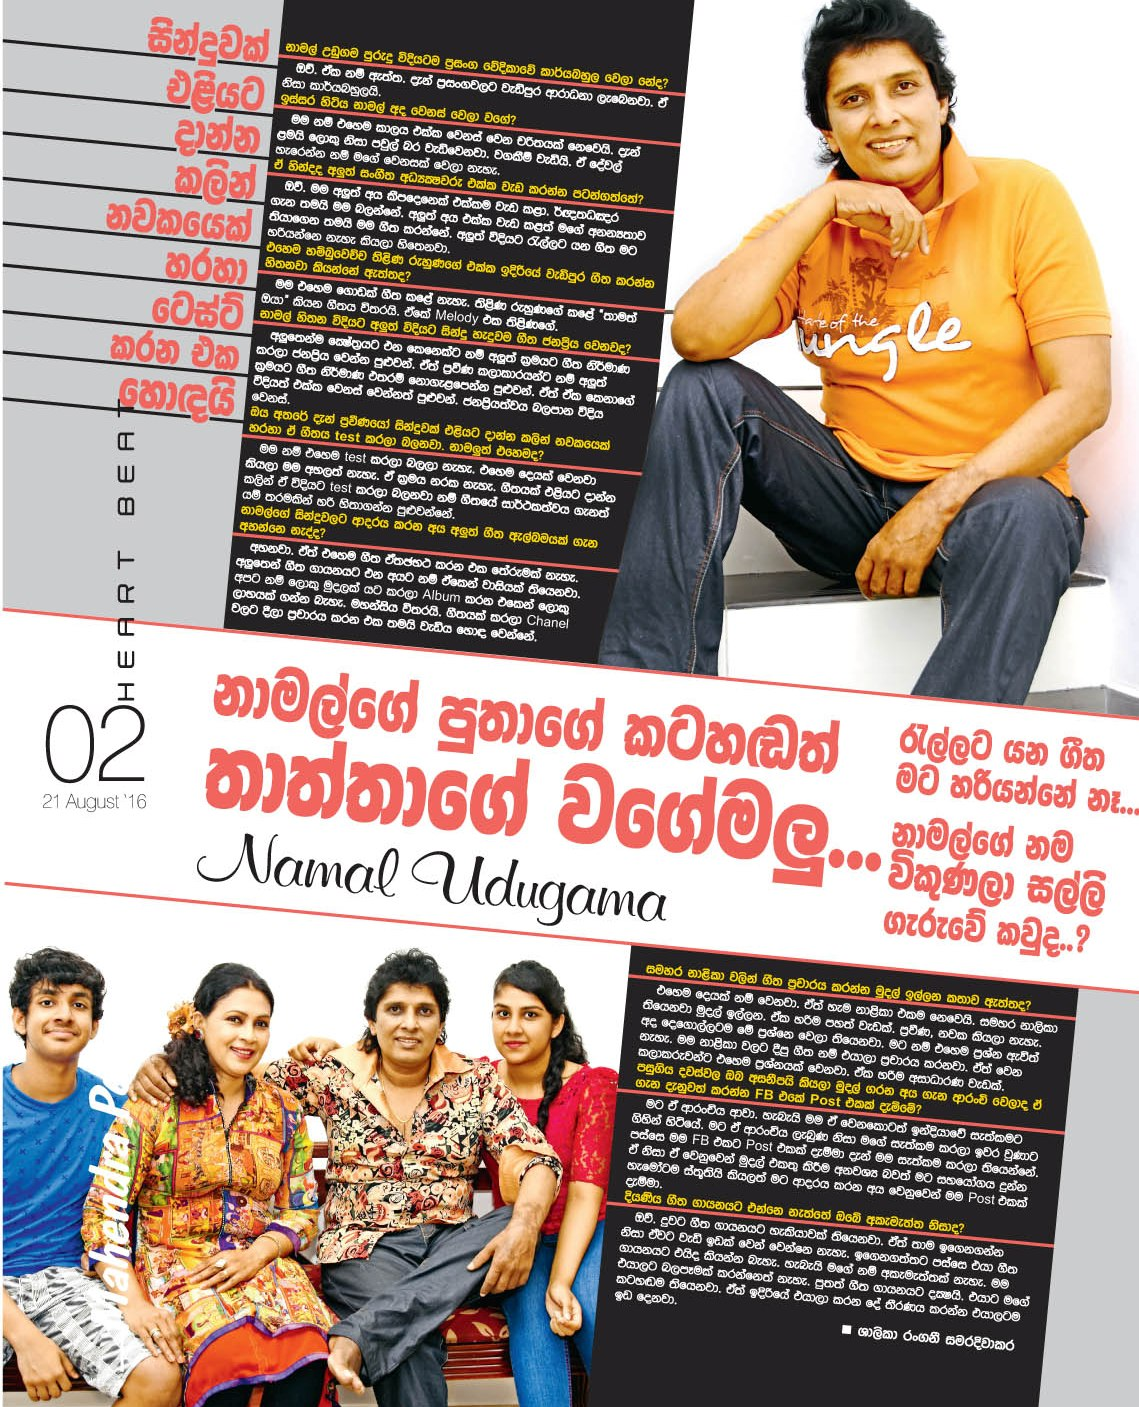 Namal Udugama Returns Sri Lanka | Gossip Lanka News